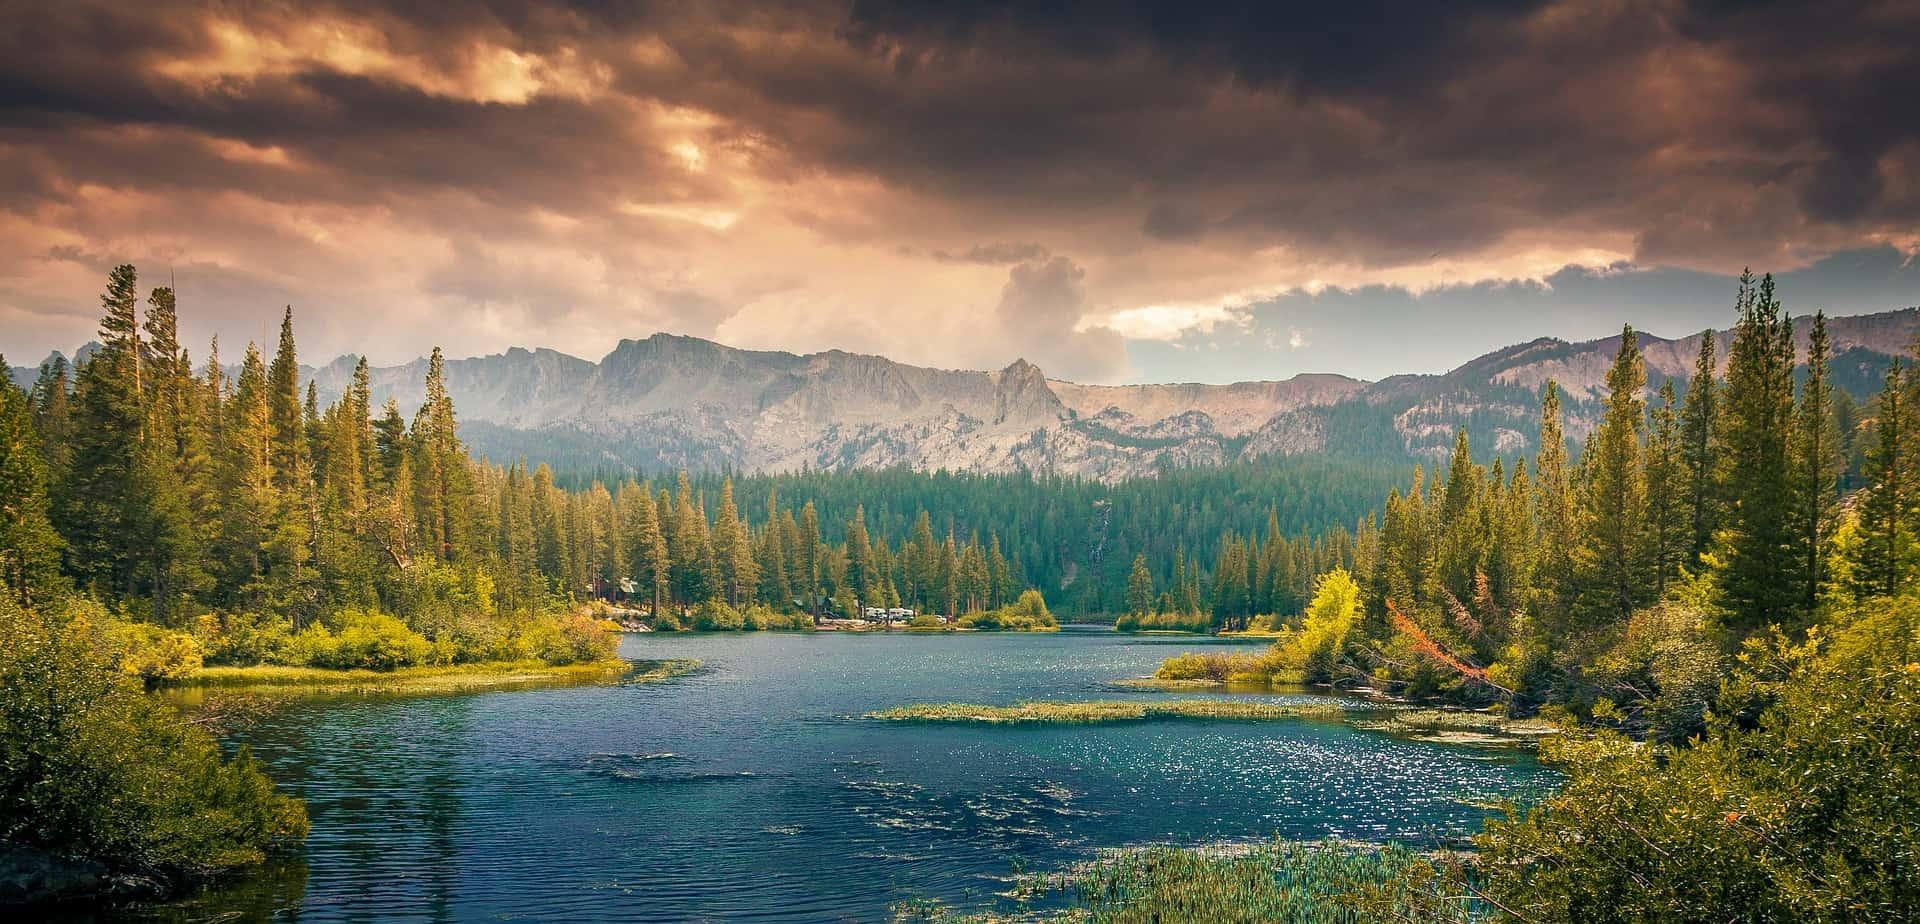 Landschaft Kanada Urlaub